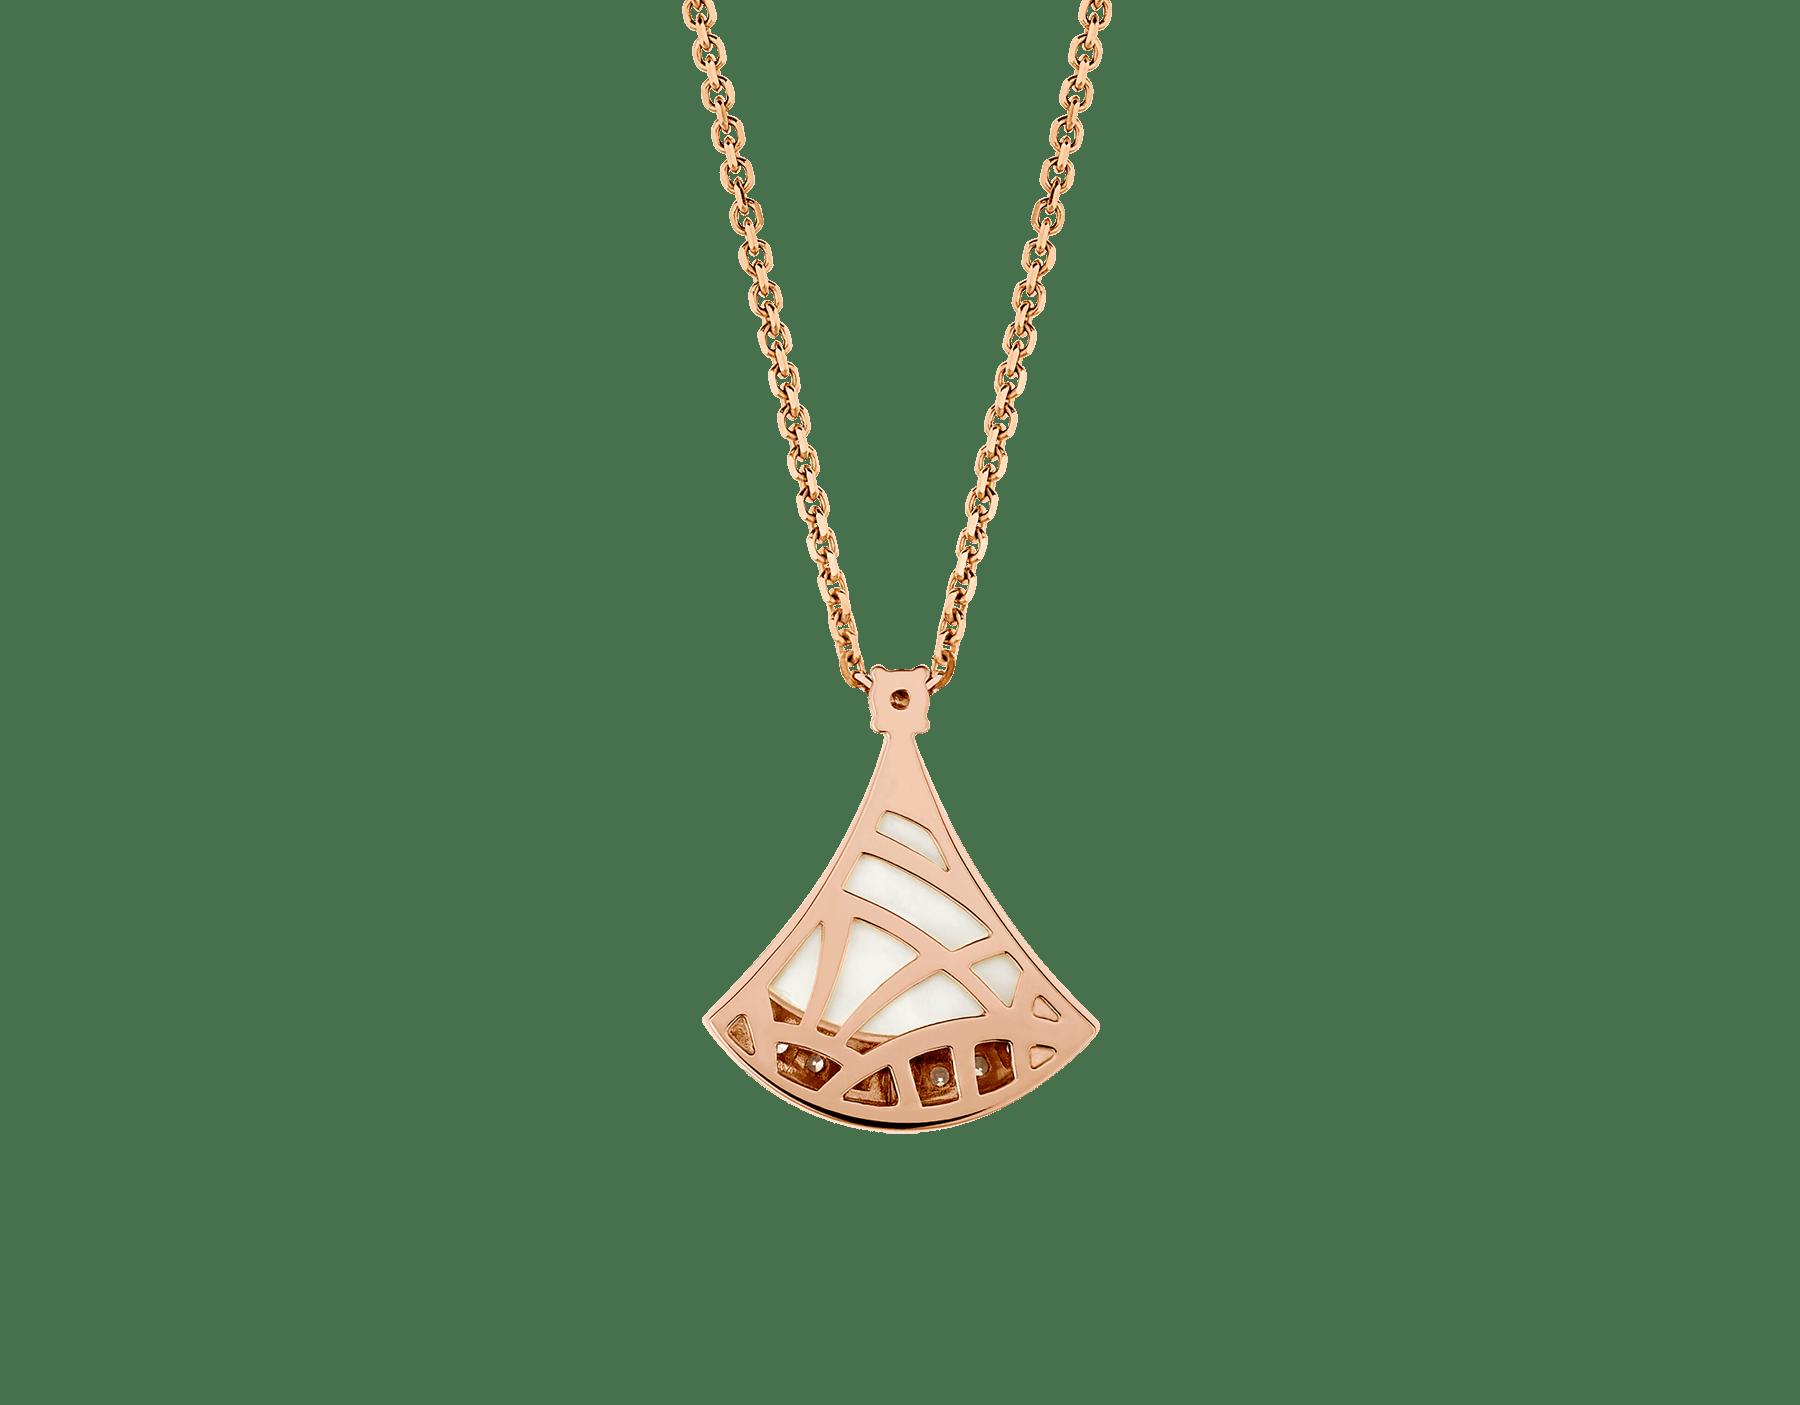 DIVAS' DREAM 18K 玫瑰金項鍊,鑲飾 1 顆鑽石(0.03 克拉)、珍珠母貝和密鑲鑽石(0.10 克拉)。 358365 image 4